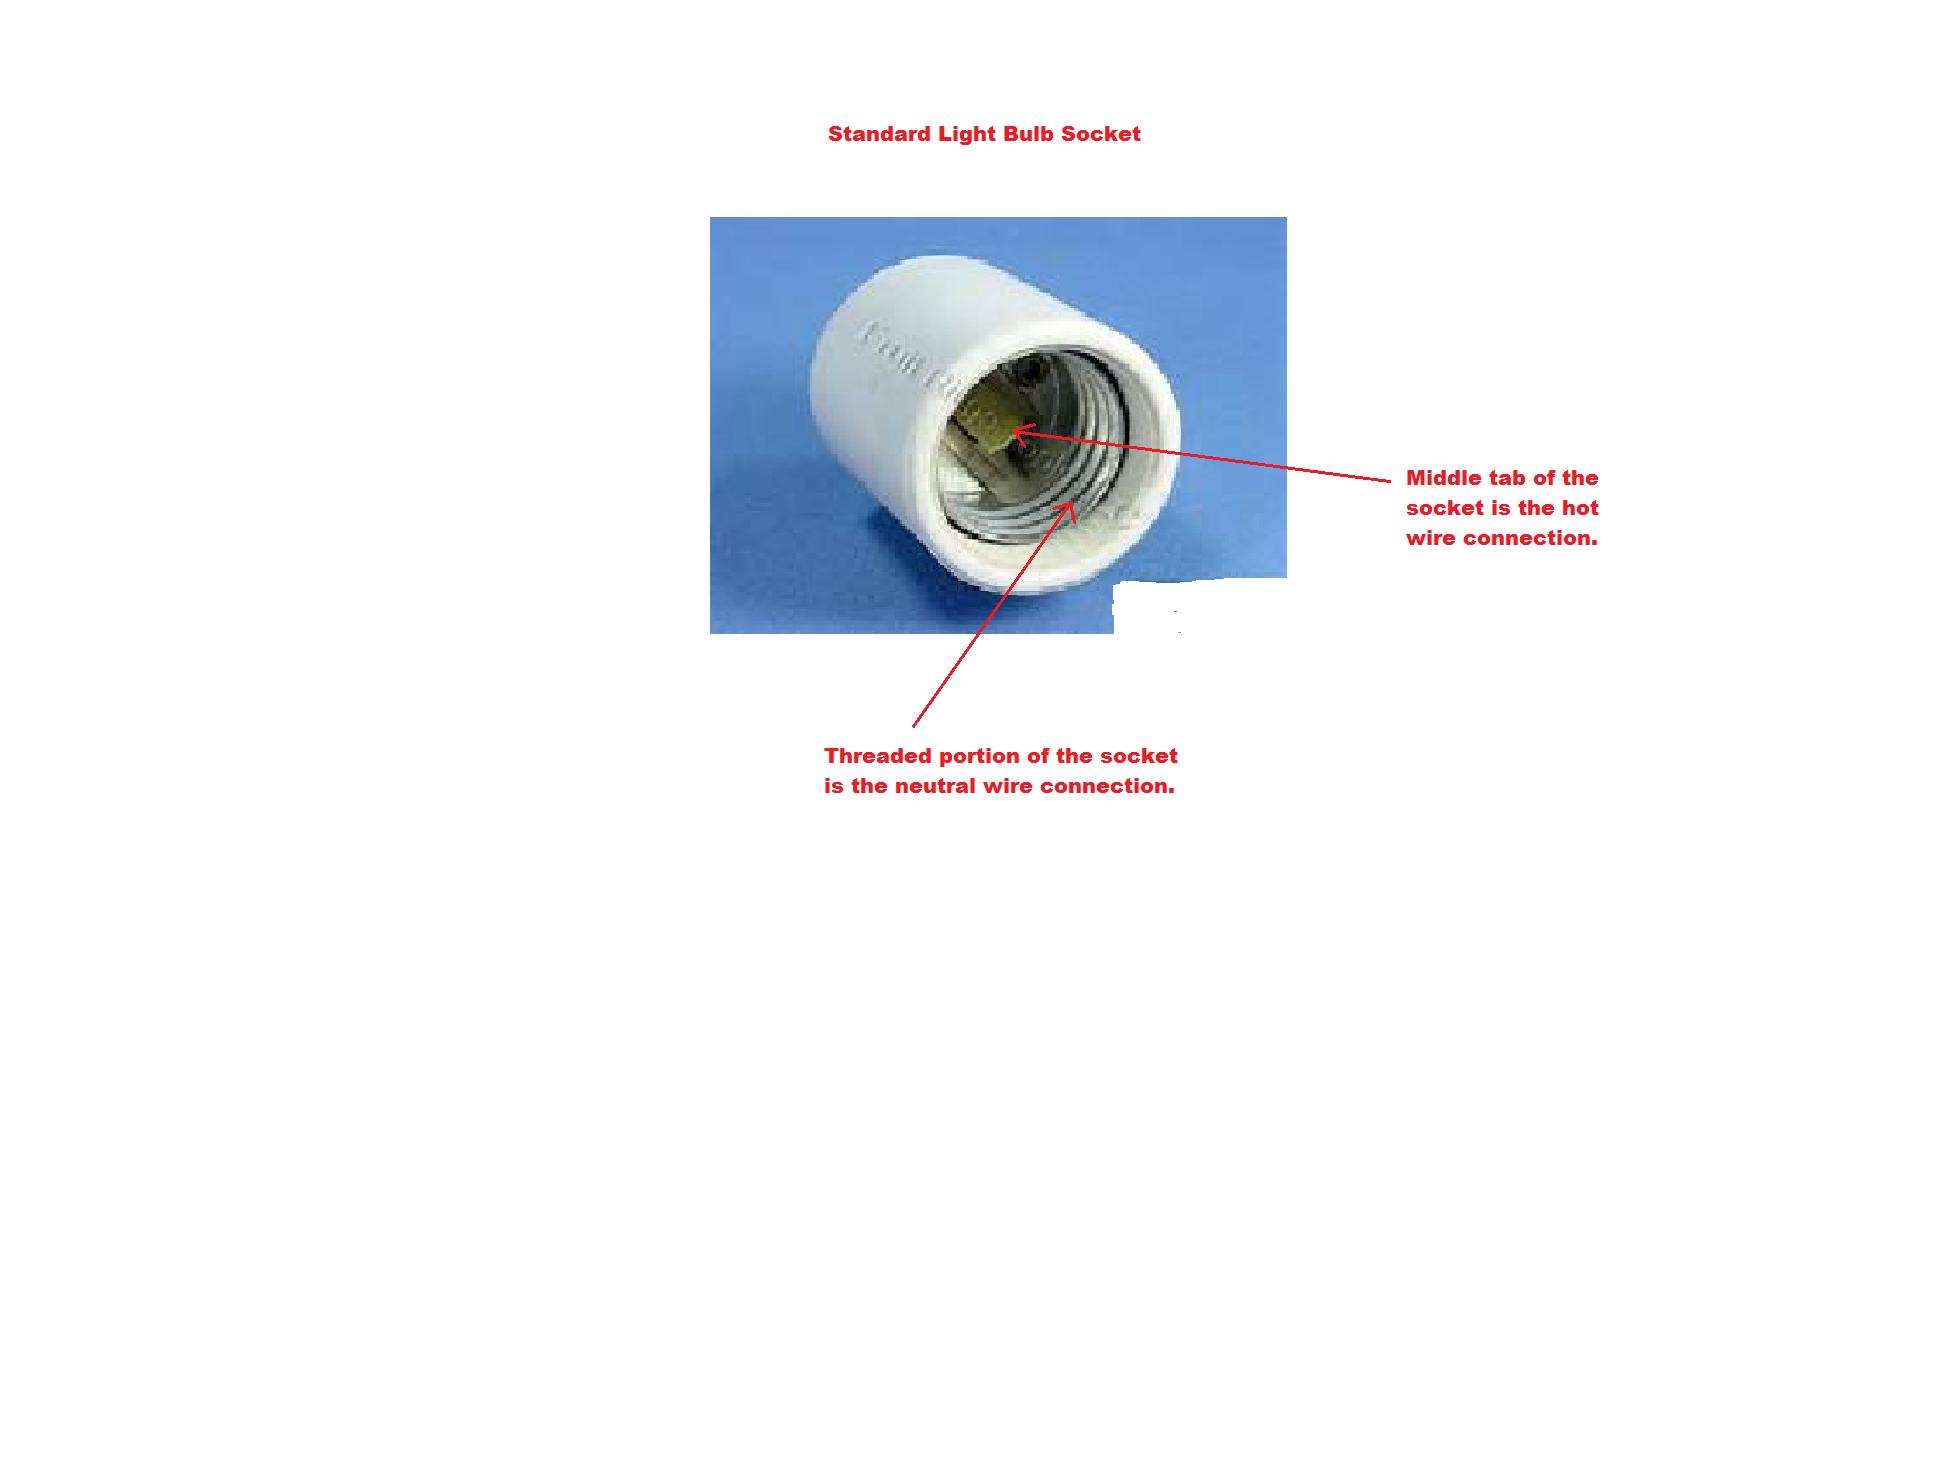 0e5d5b89-892c-4b00-a823-8203a39a013a_Light Bulb Socket Pic.png